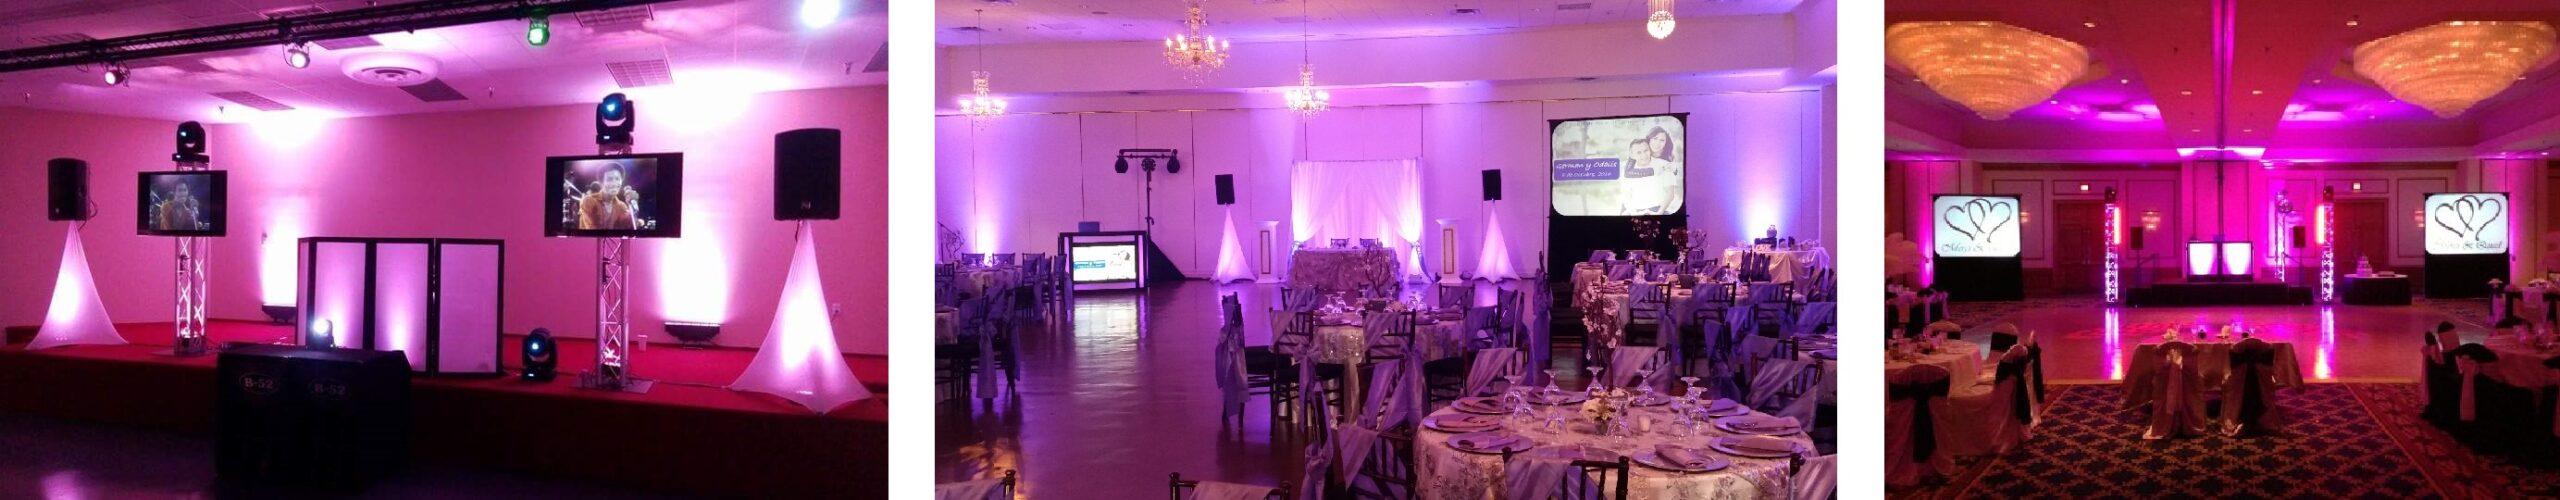 Houston Wedding DJ, Wedding DJs in Houston, Master of Ceremonies, Disc Jockey, MC, EMCEE, Bilingual, Hispanic, Latino, Spanish, Video, A/V, Audio Visual, Flat Screens, Awesome Music Entertainment, AME DJs, Sonido DJ Sammy de Houston